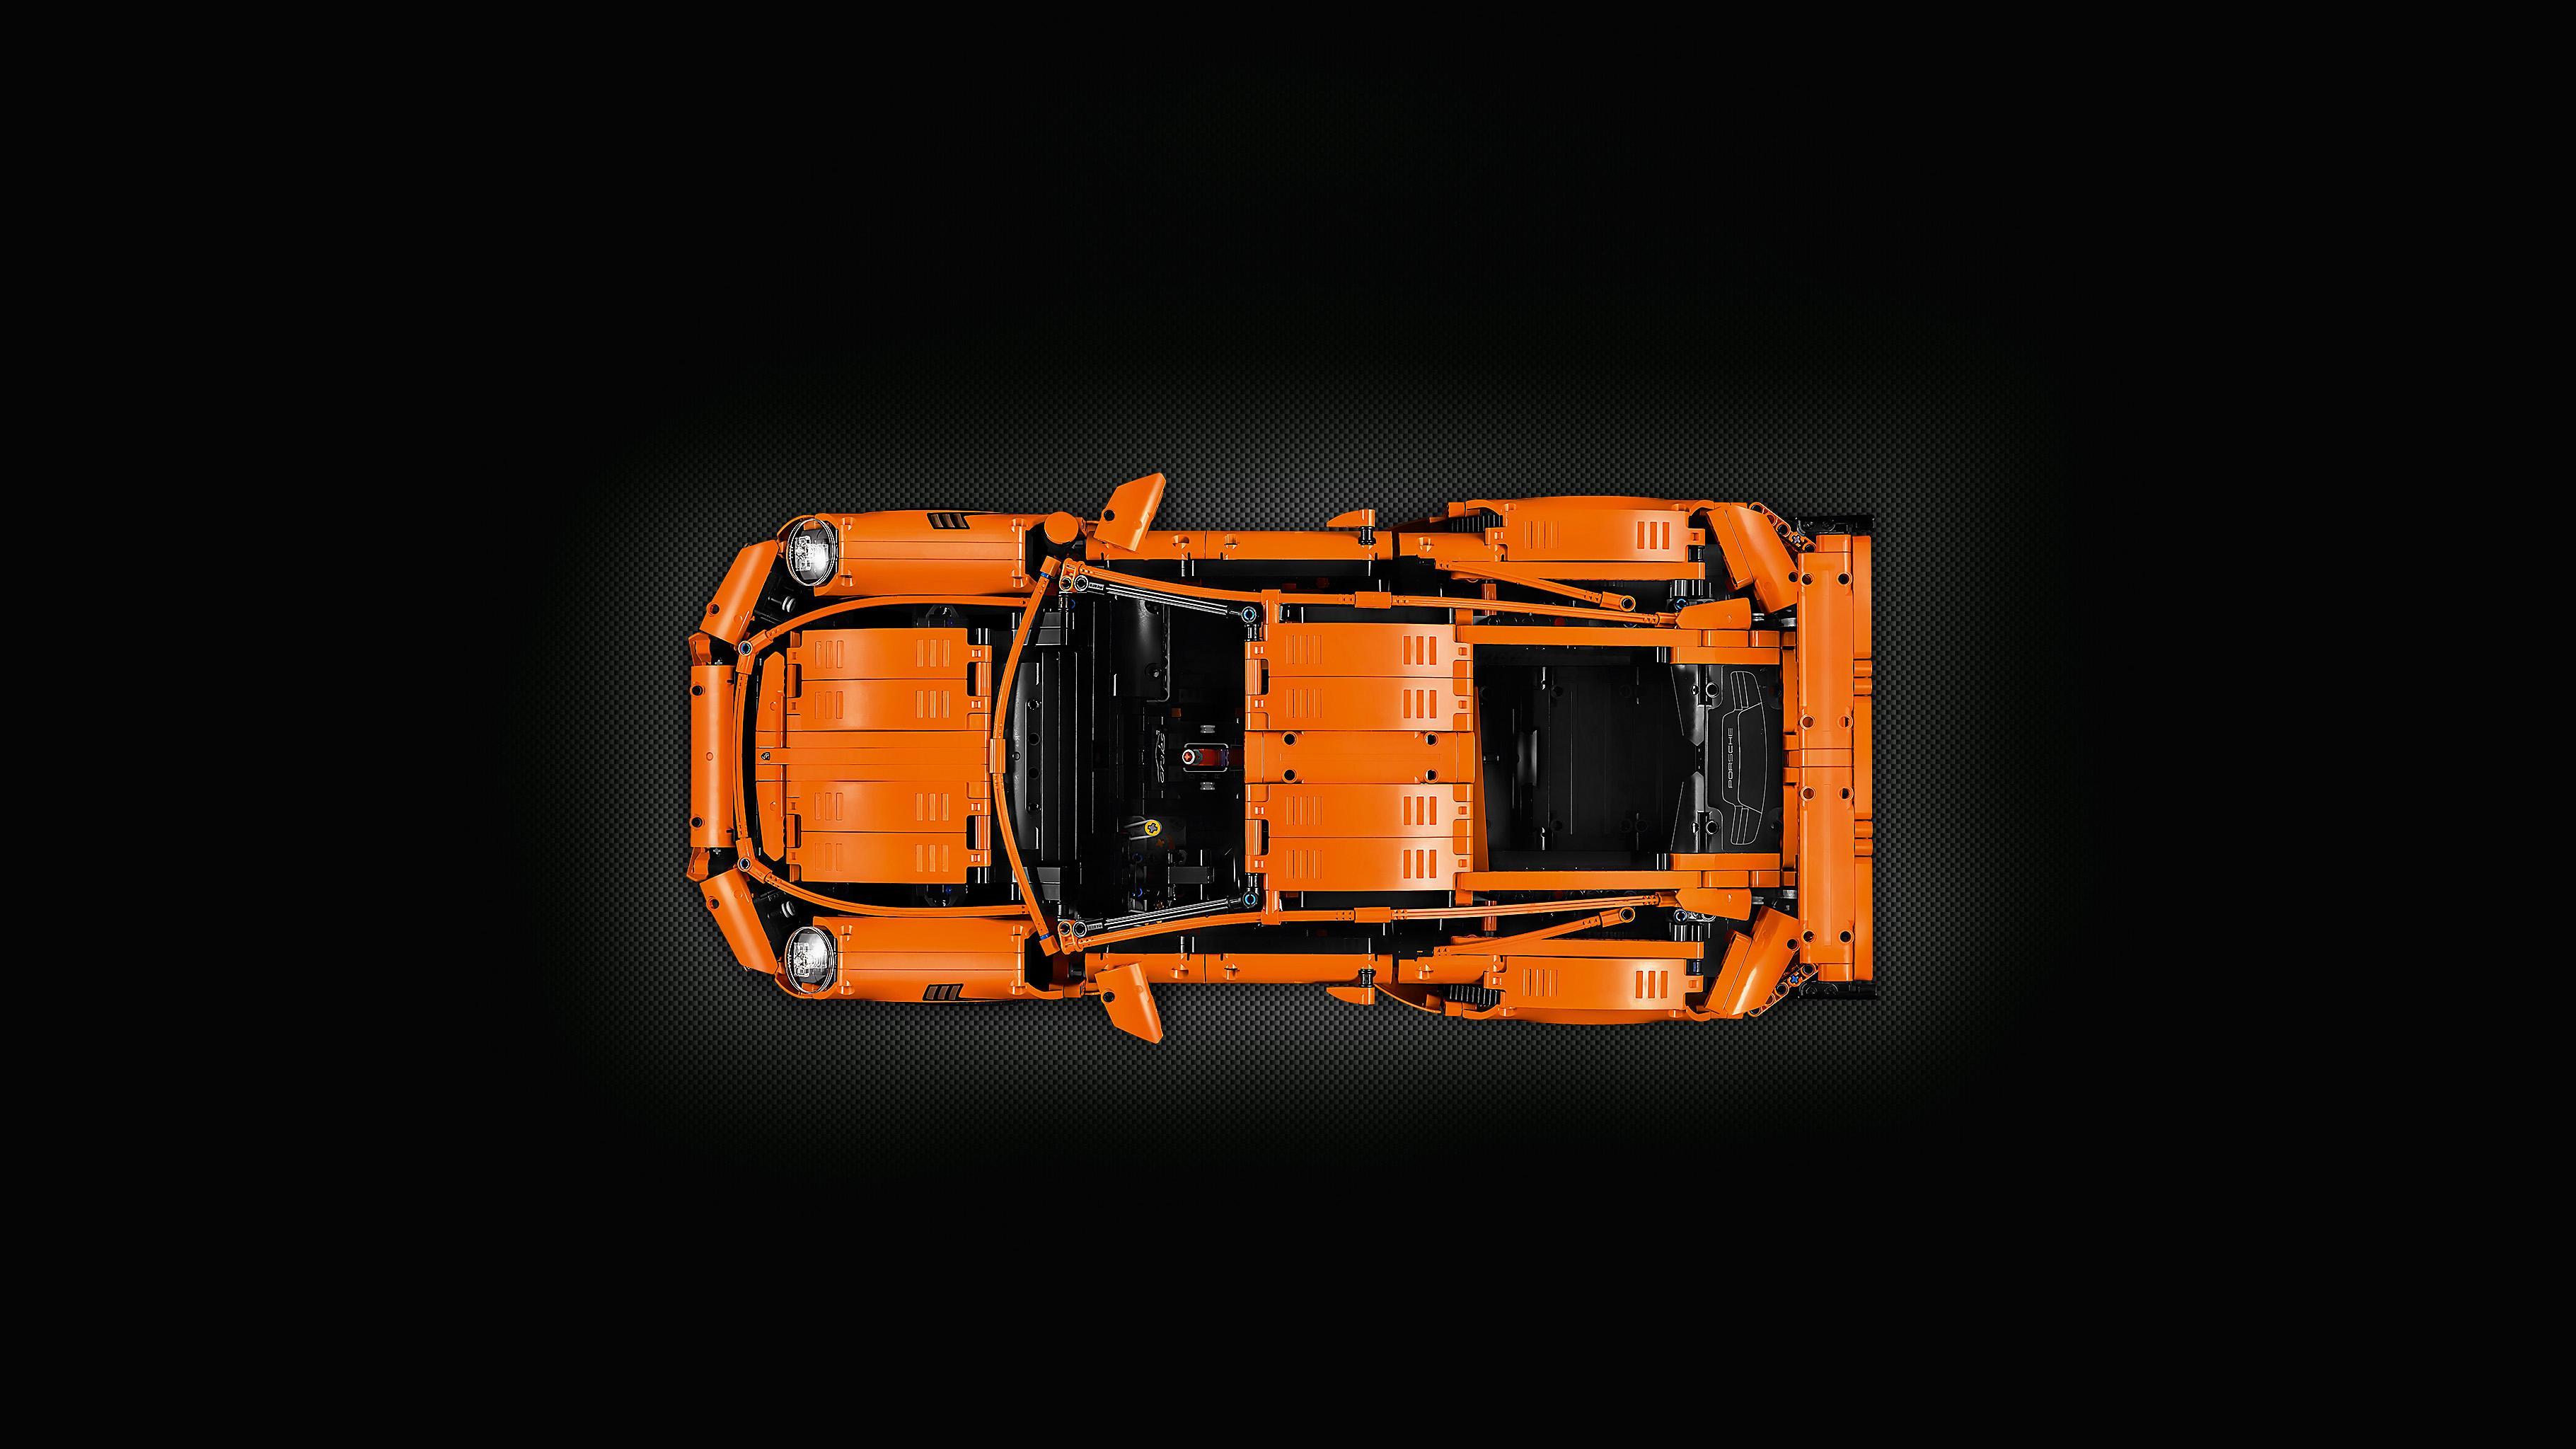 lego technic porsche 911 gt3 rs toys games. Black Bedroom Furniture Sets. Home Design Ideas